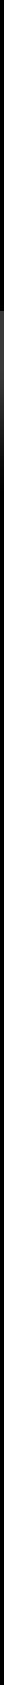 black_background_repeat.jpg